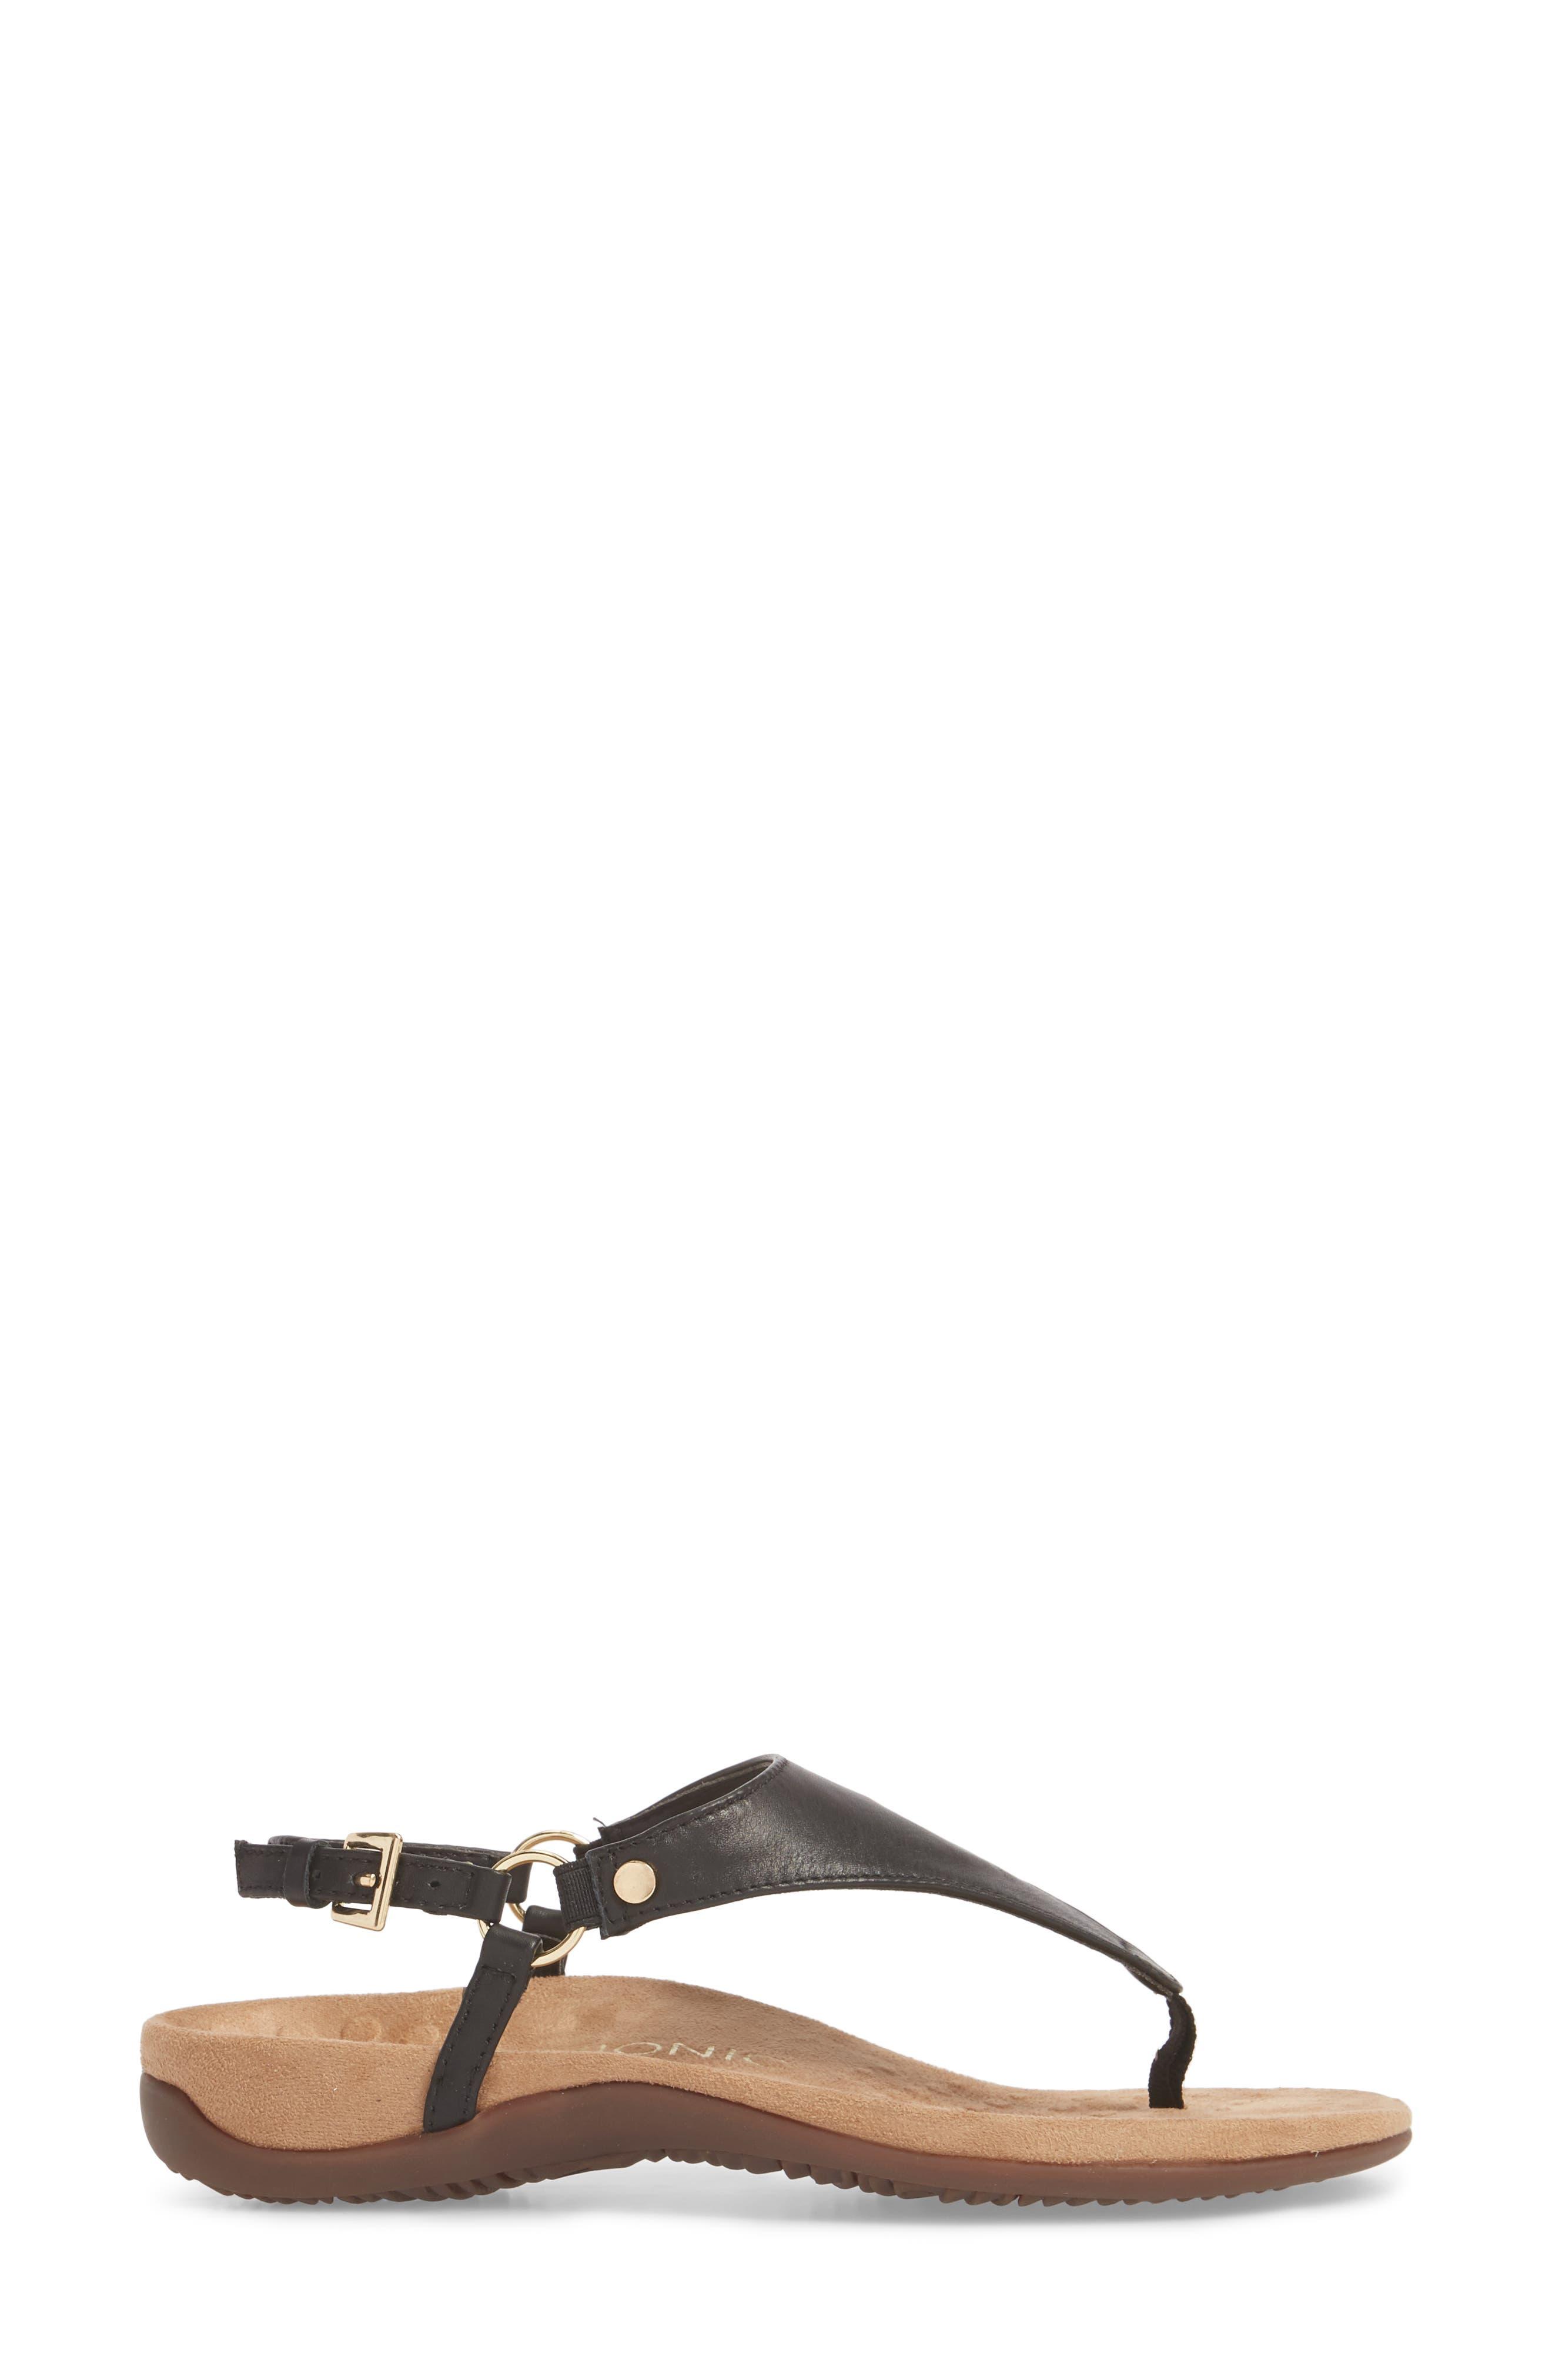 Kirra Orthaheel<sup>®</sup> Sandal,                             Alternate thumbnail 3, color,                             Black Leather